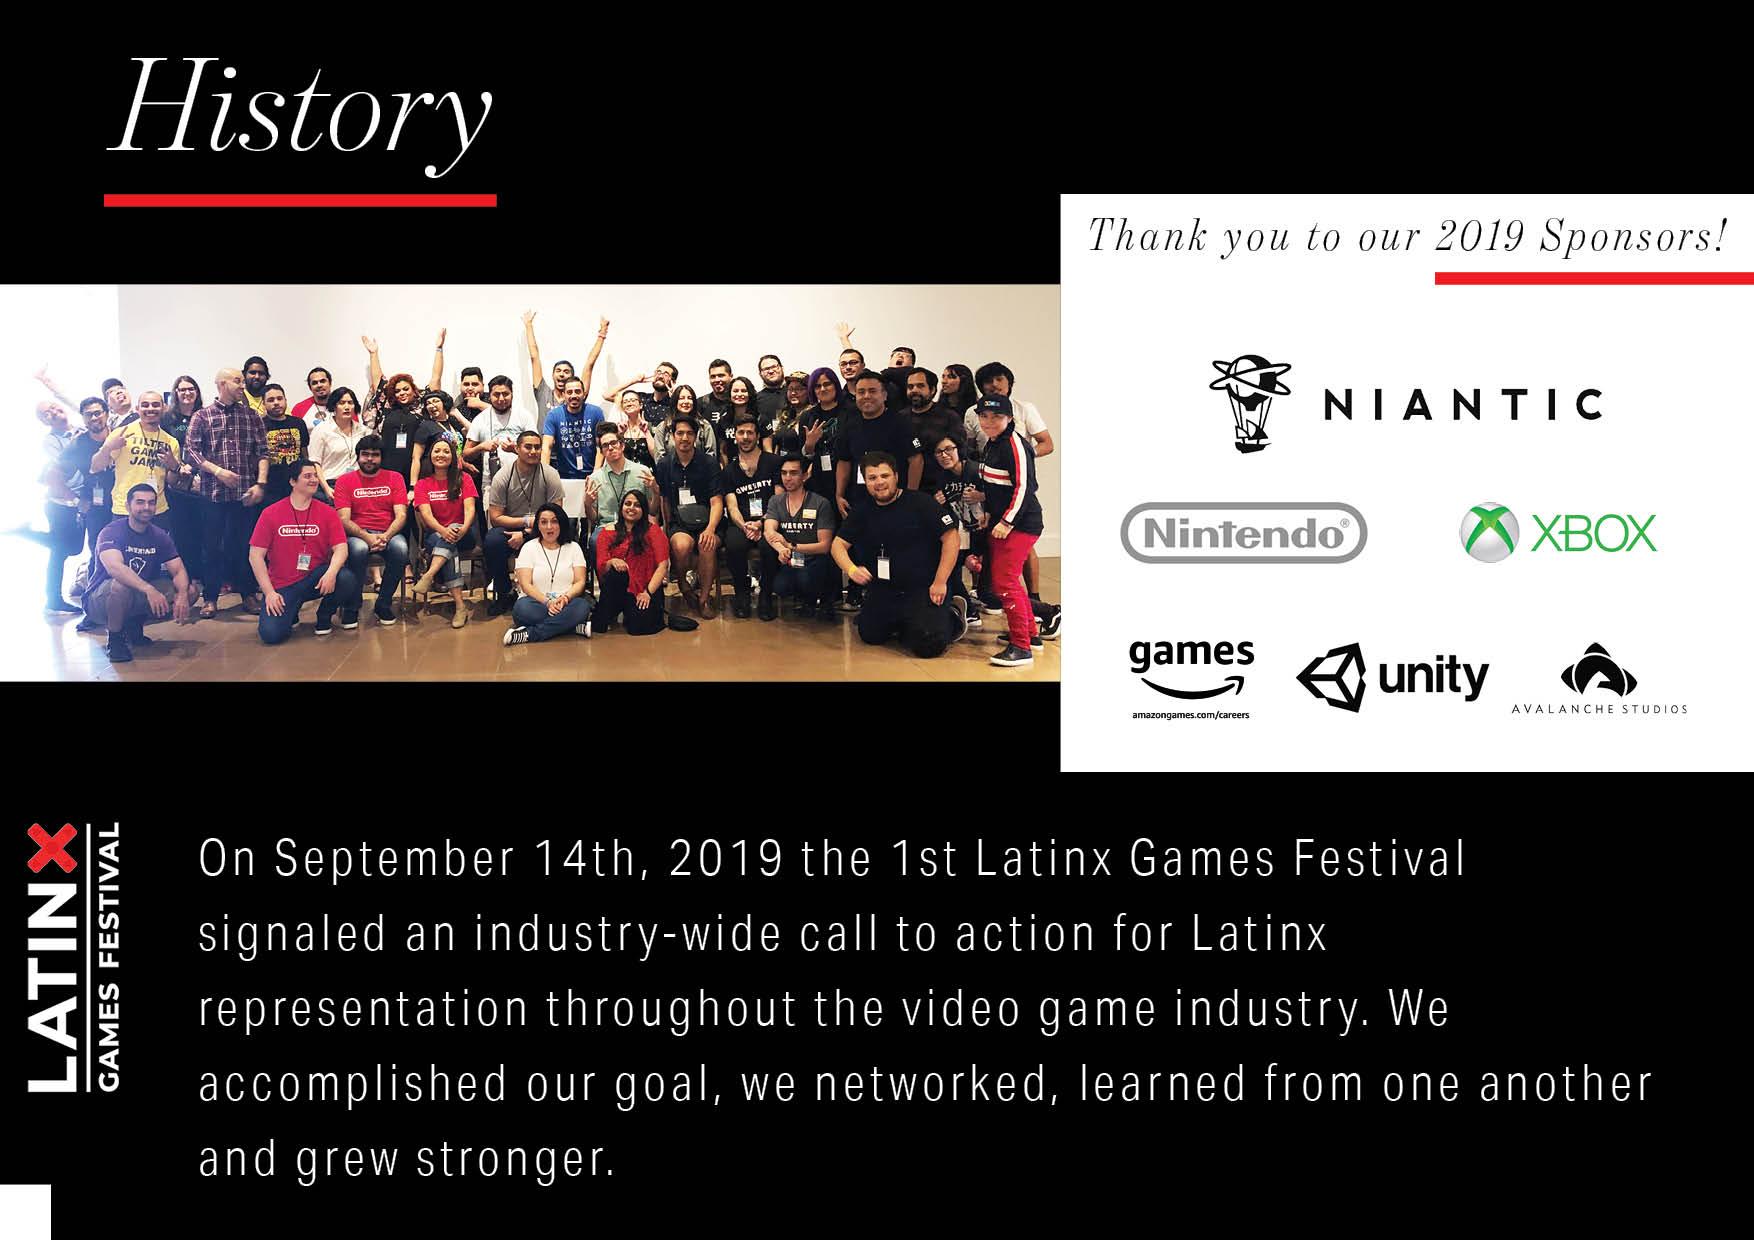 Latinx Games Festival History